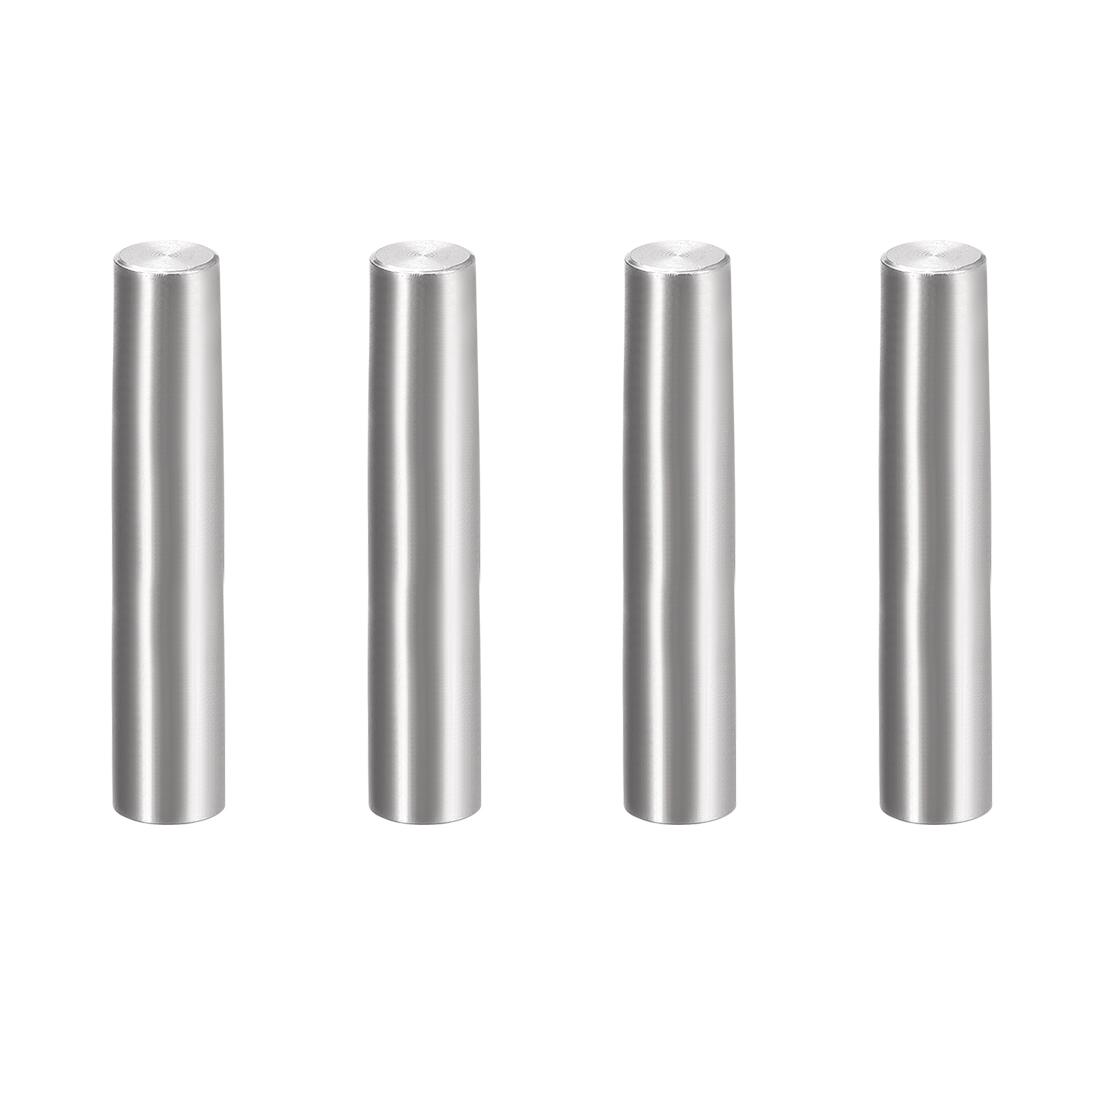 4Pcs 8mm x 45mm 1:50 Taper Pin 304 Stainless Steel Shelf Support Pin Fasten